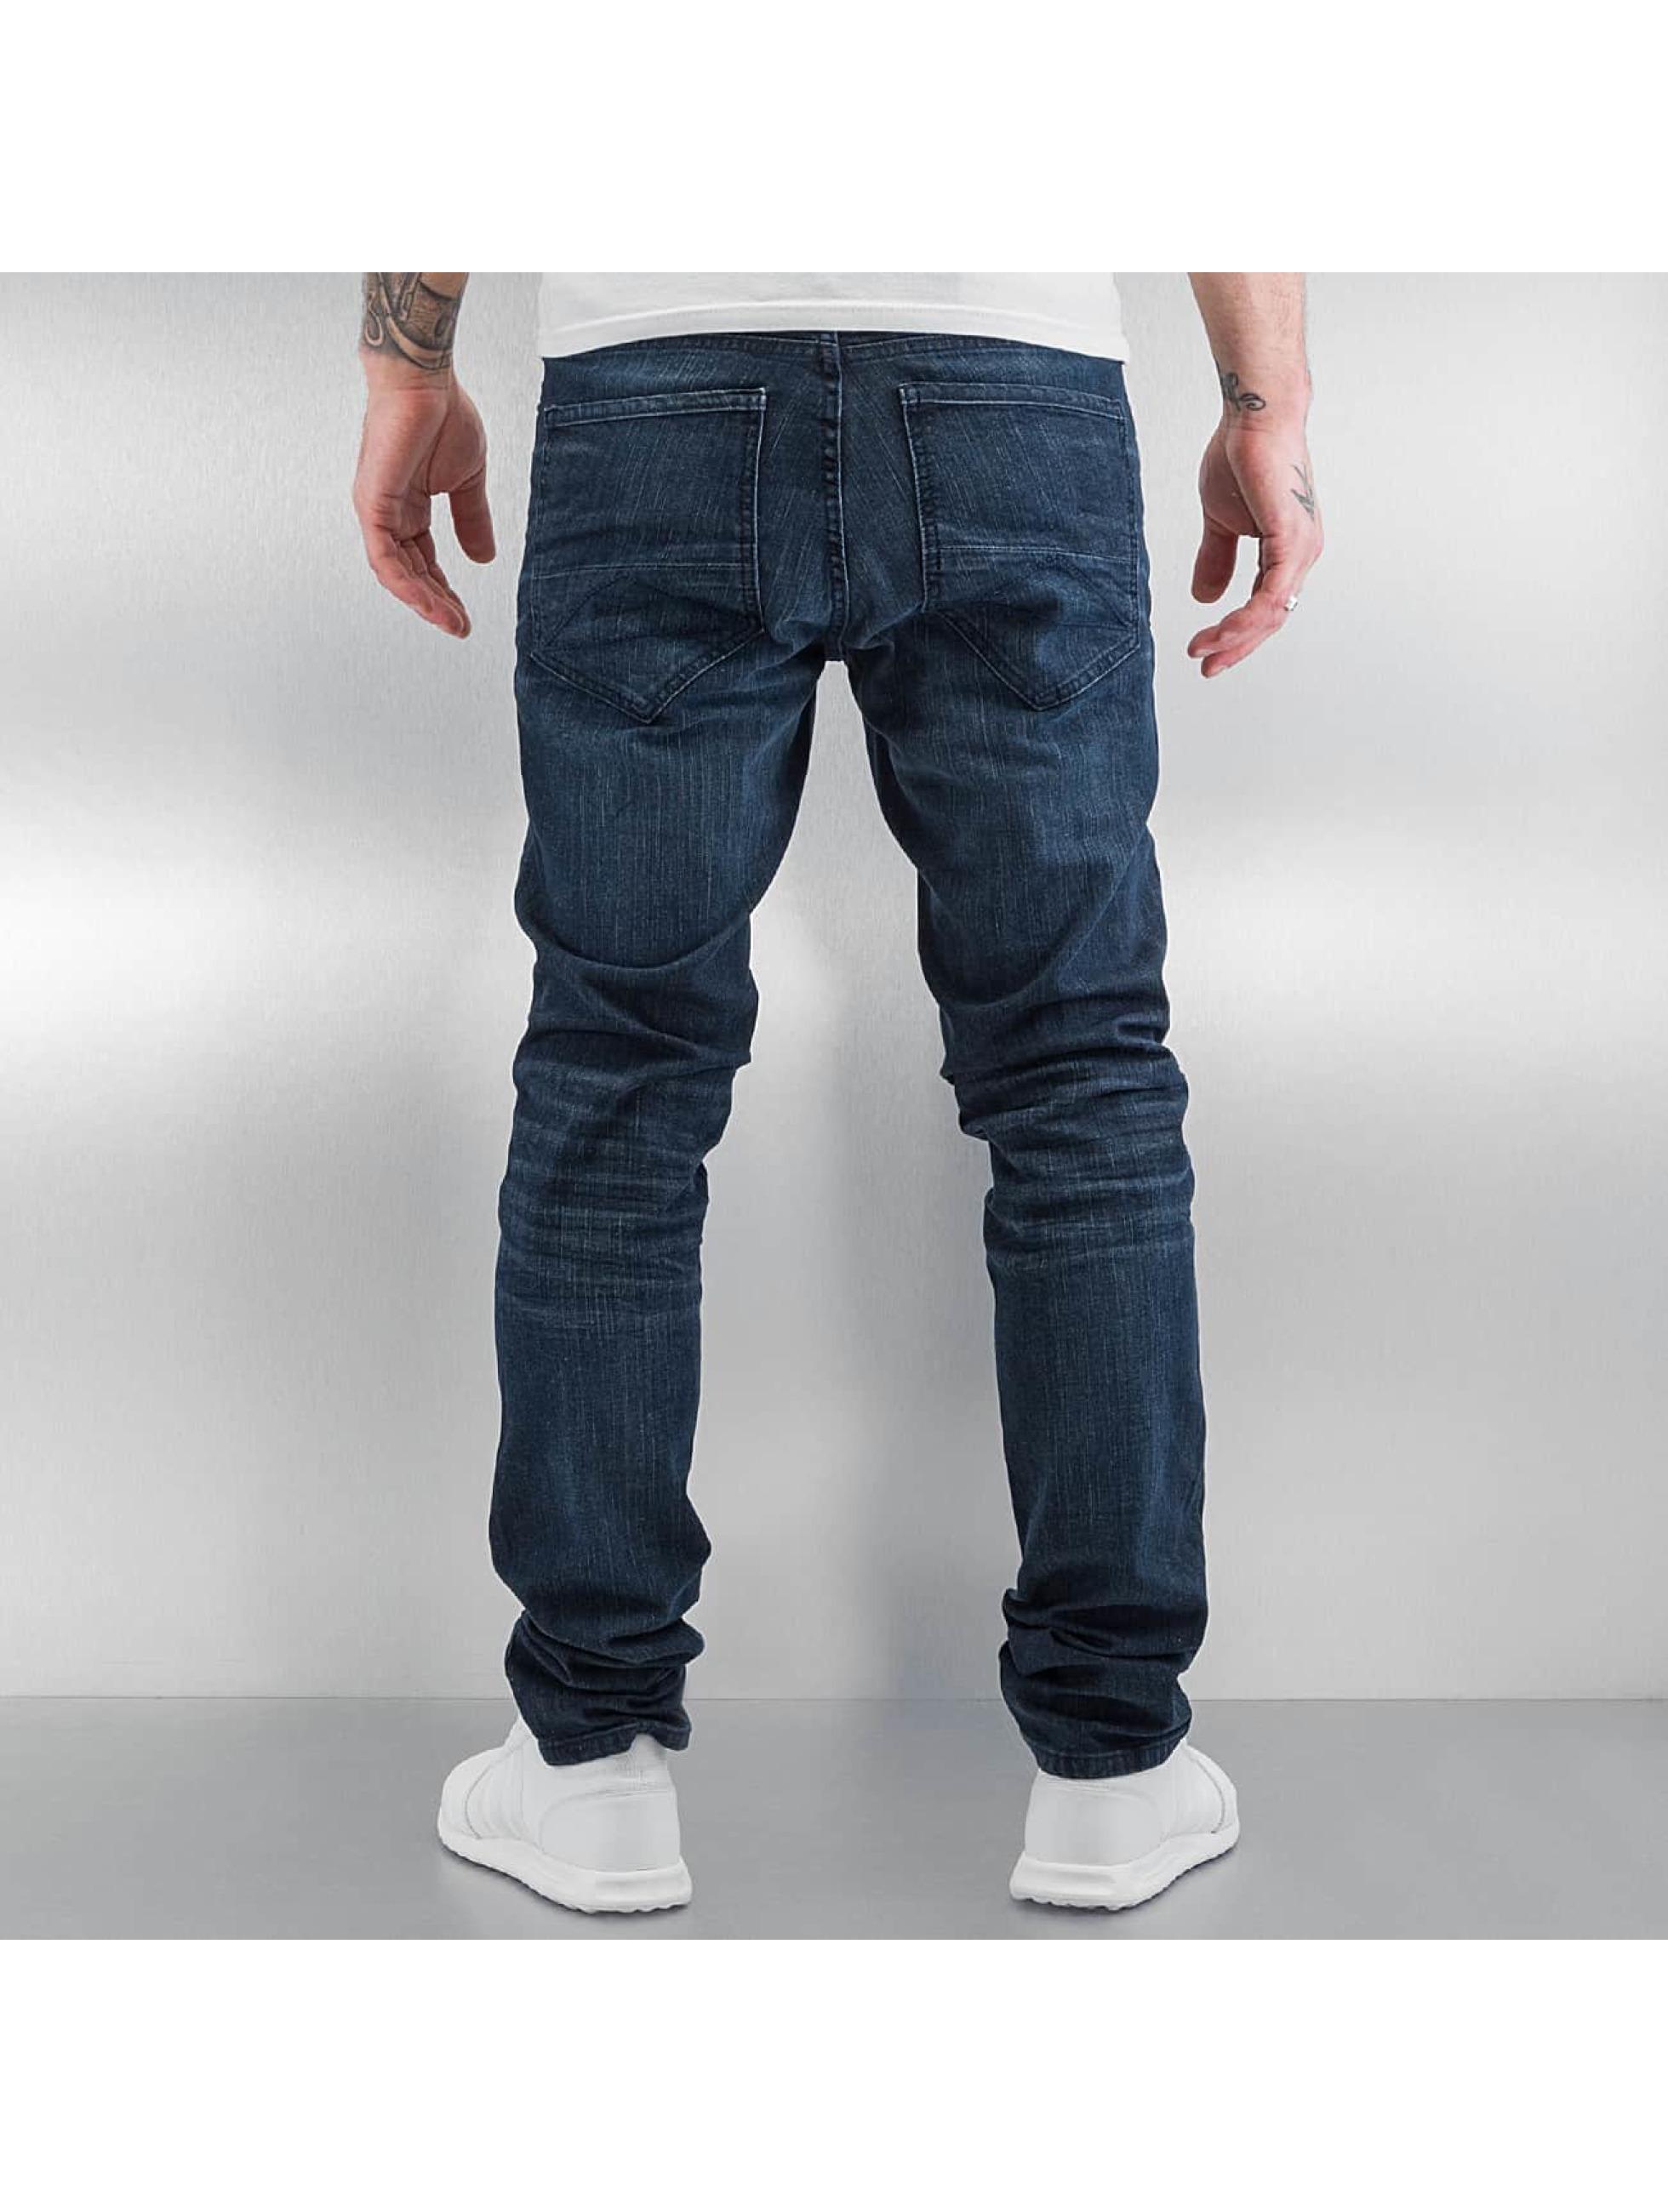 Amsterdenim Skinny Jeans Wash blue